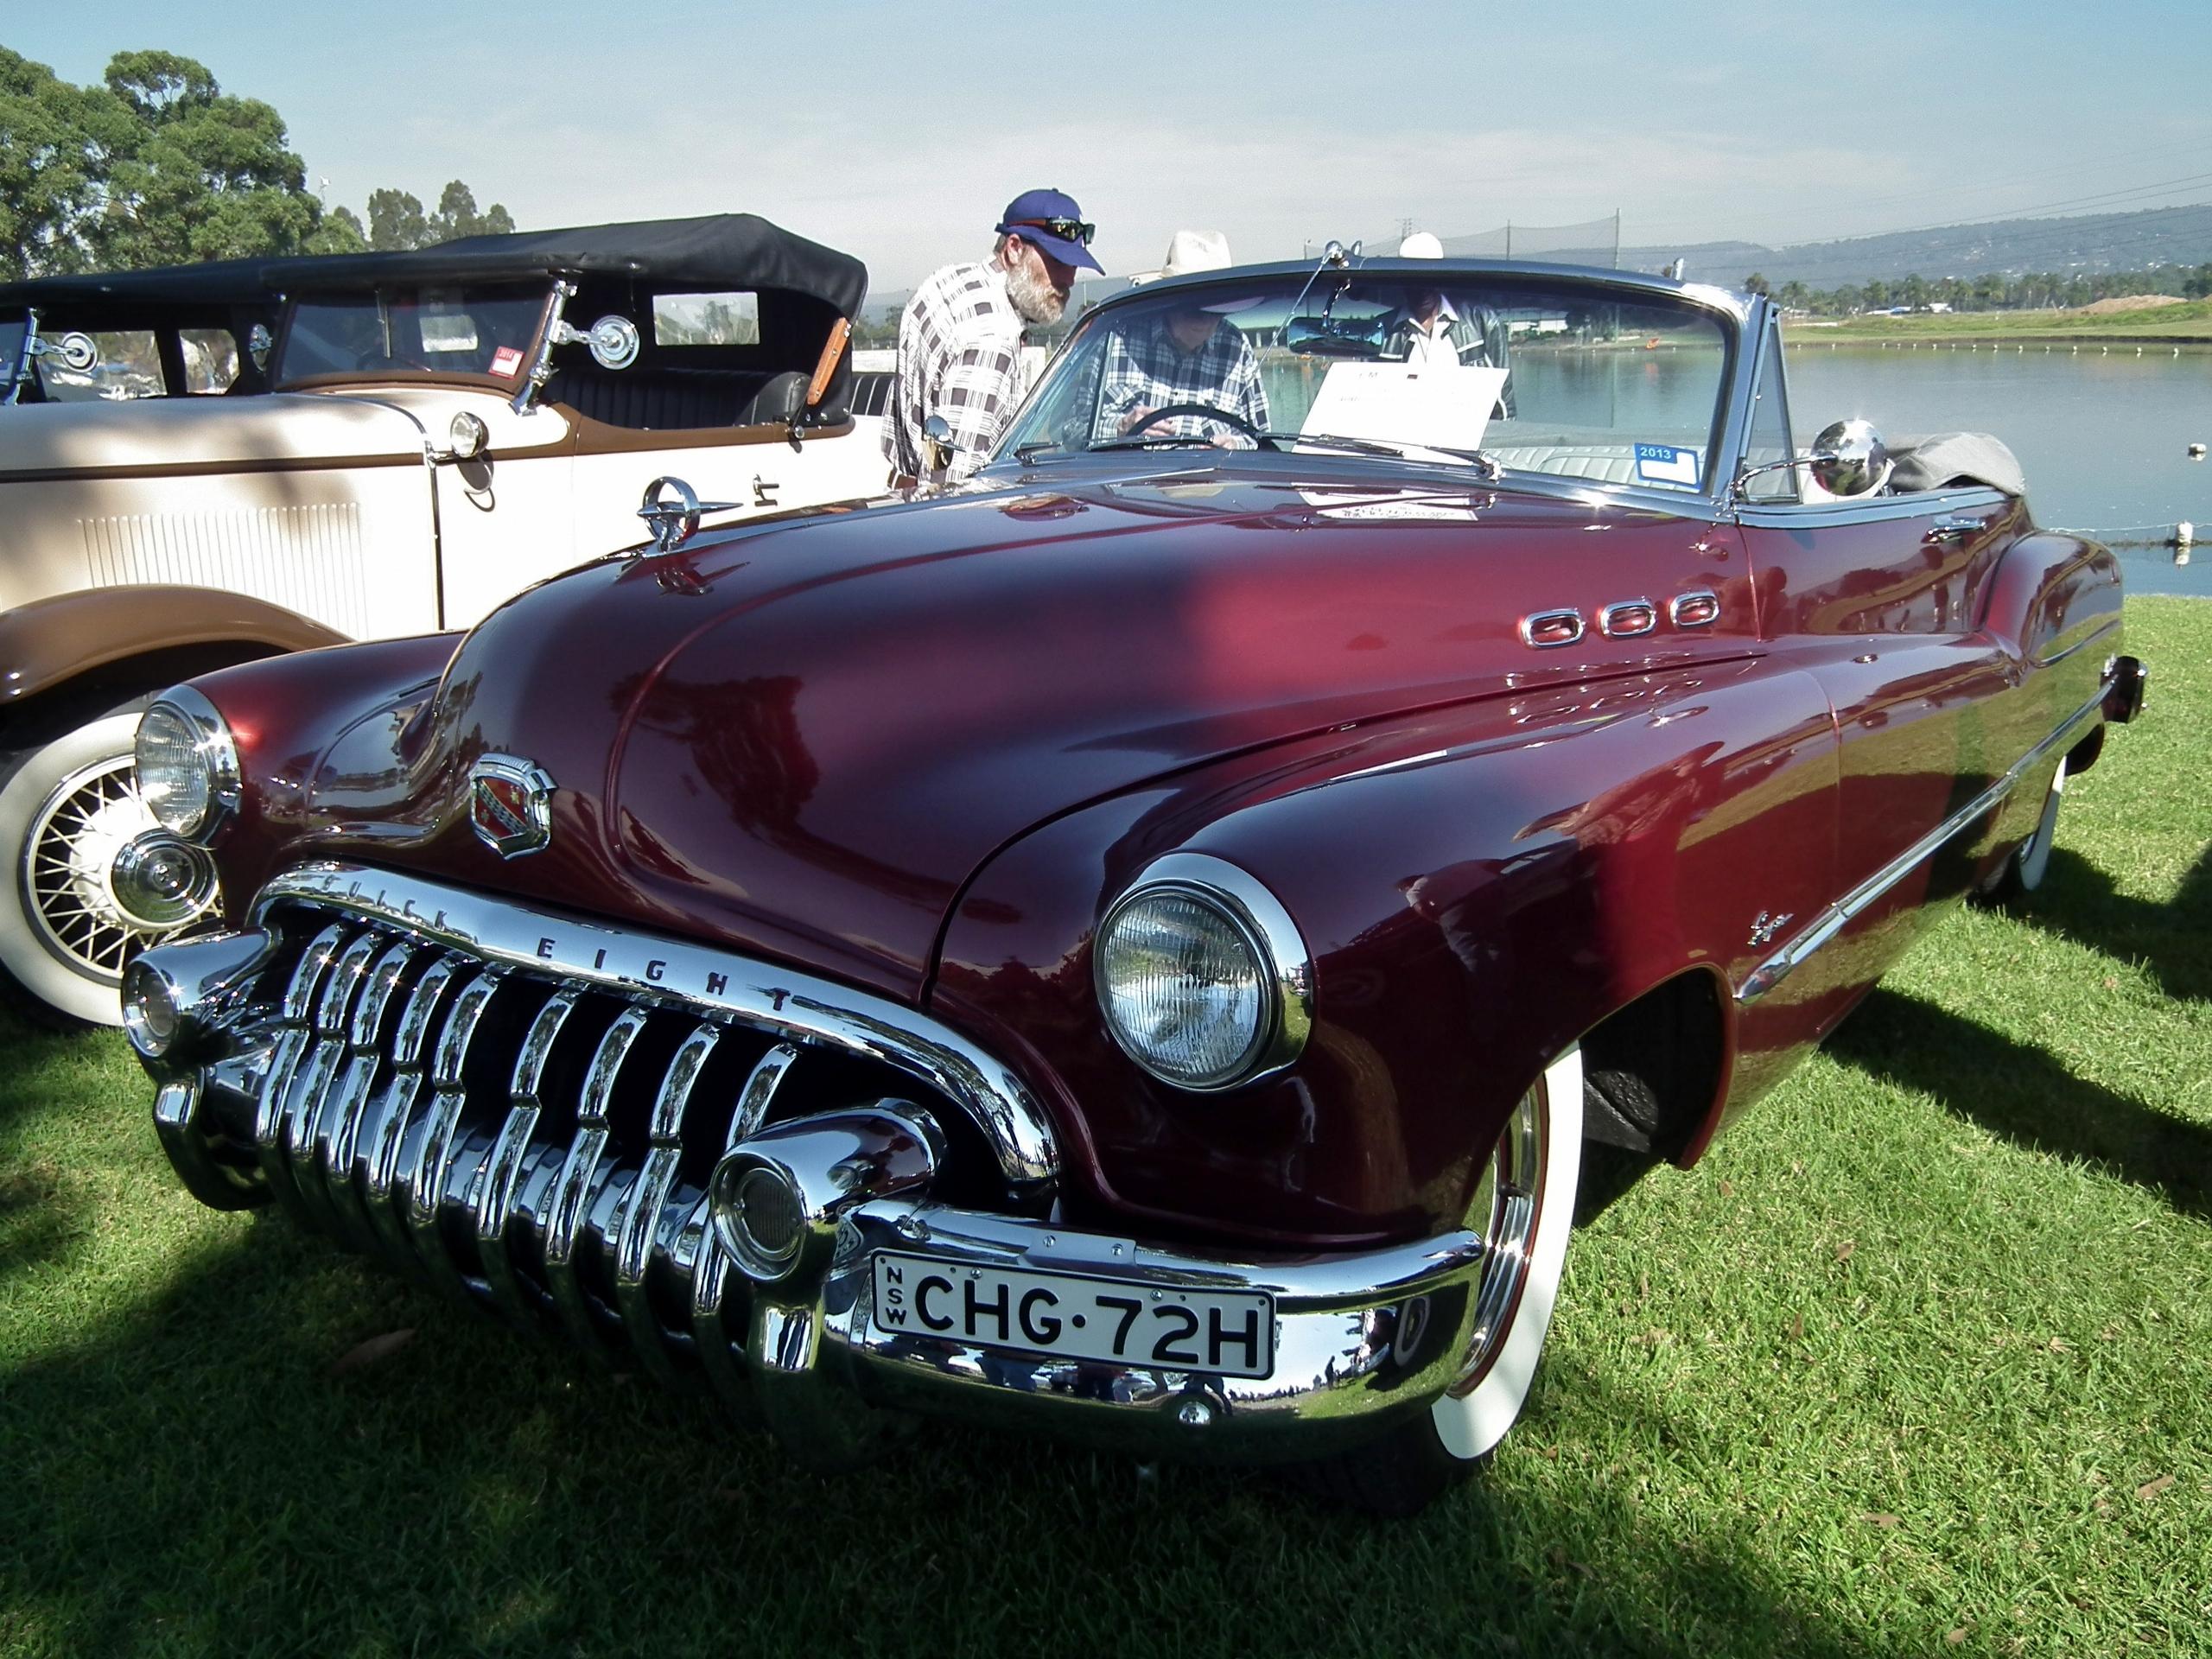 file:1950 buick eight super convertible (8702717881) - wikimedia